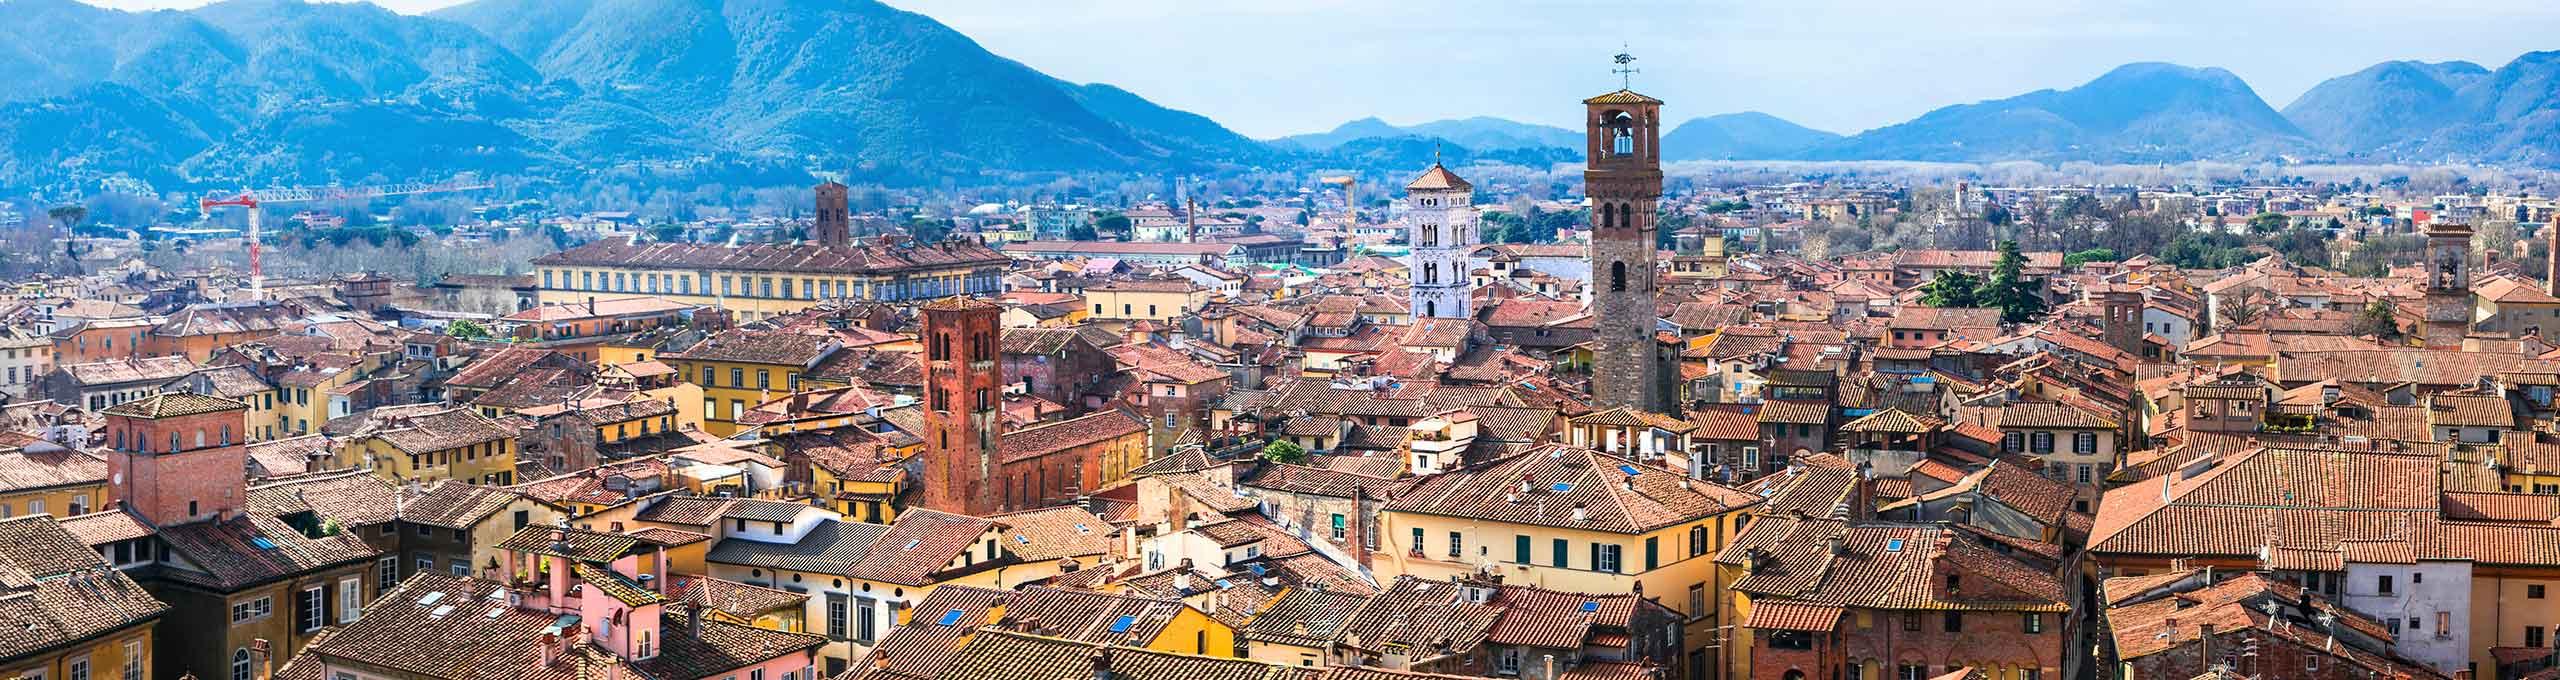 Vista sulla città di Lucca e torre Guinici